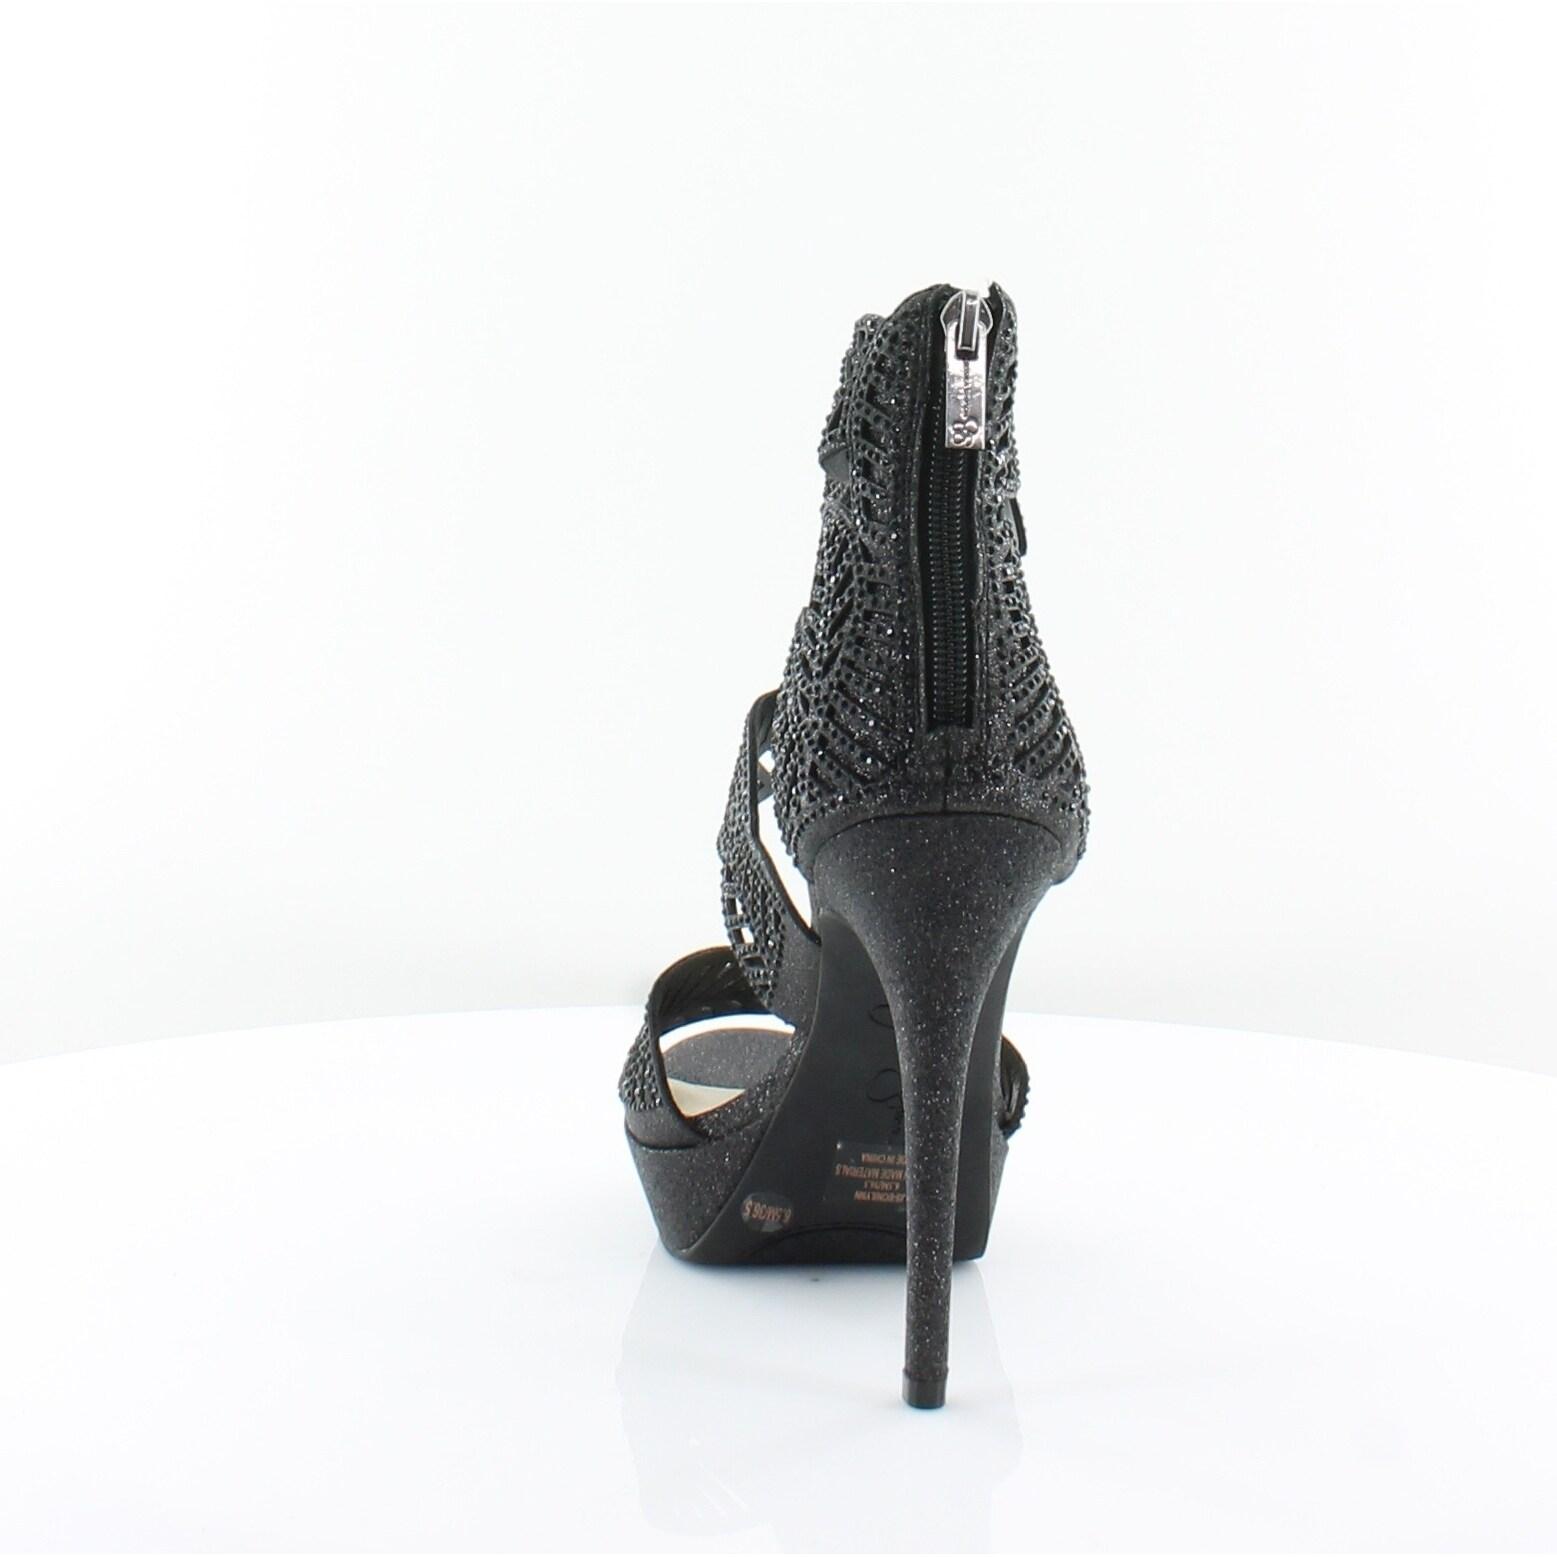 b03b6b5646f Shop Jessica Simpson Bonilynn Women s Heels Black - Free Shipping Today -  Overstock - 26396096